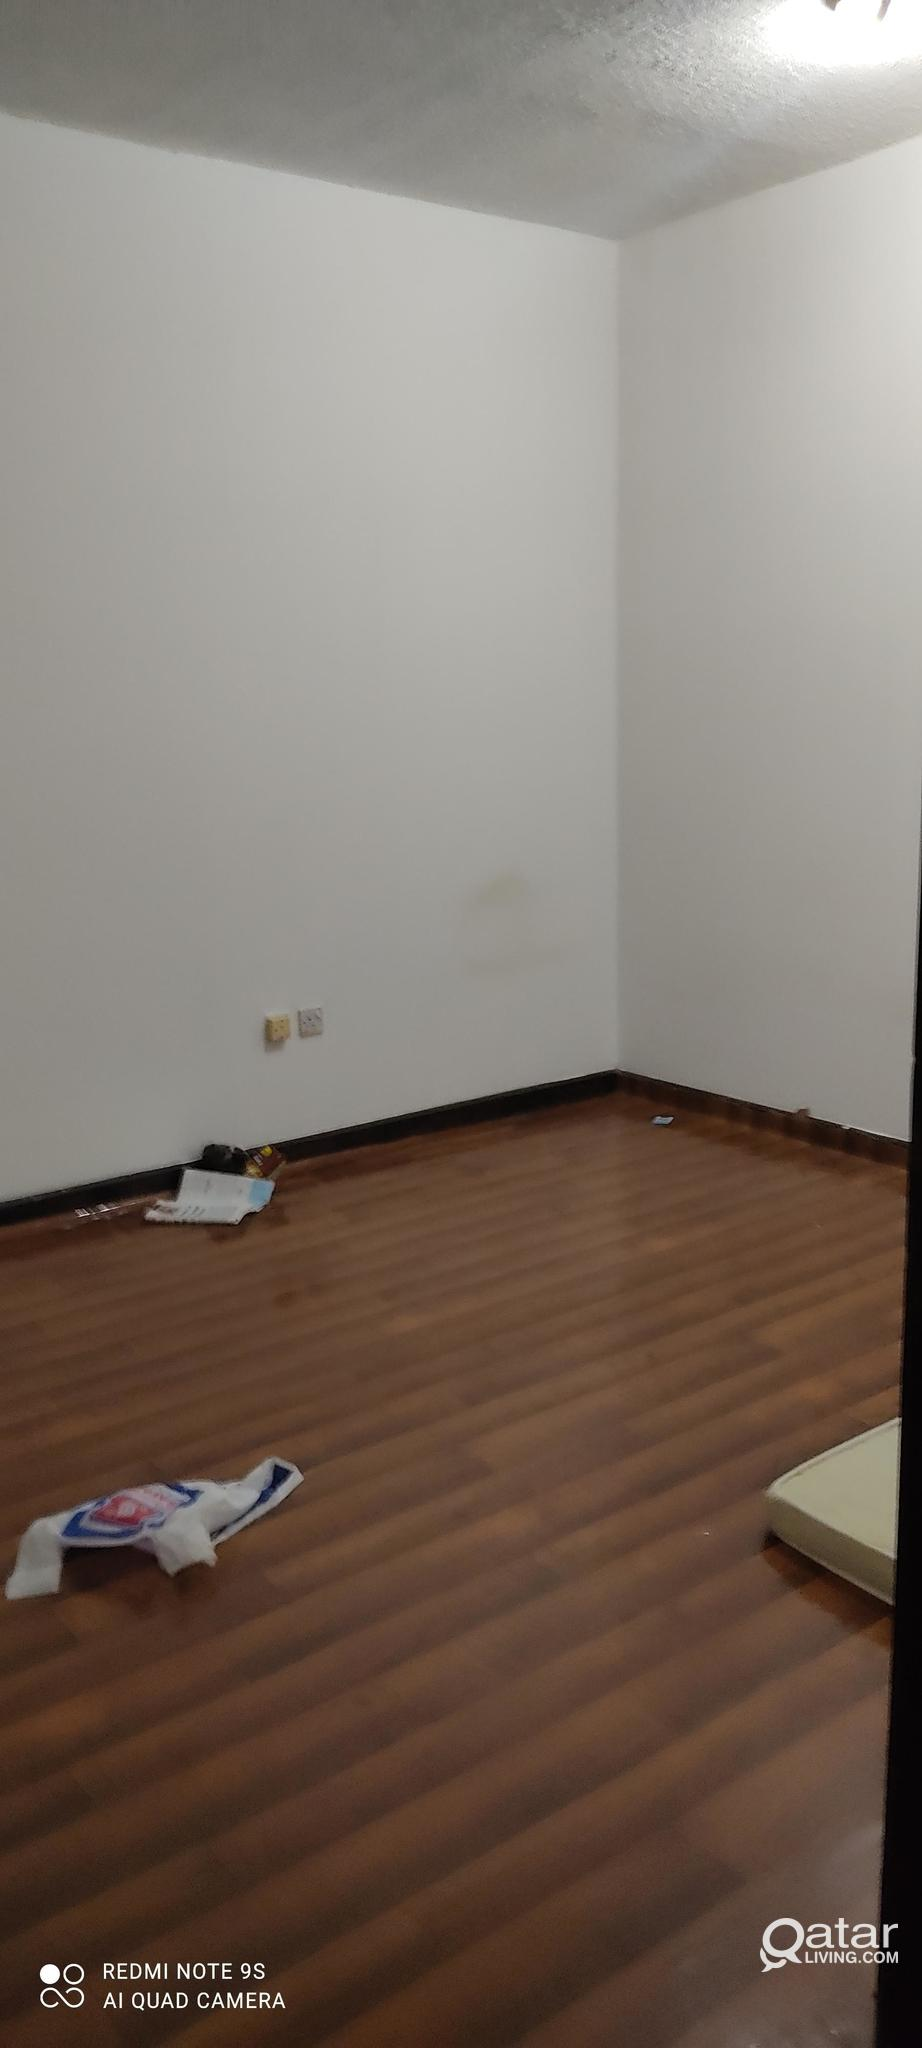 EXECUTIVE BACHELOR'S ROOM IN A FLAT NAJMA NEAR HOT